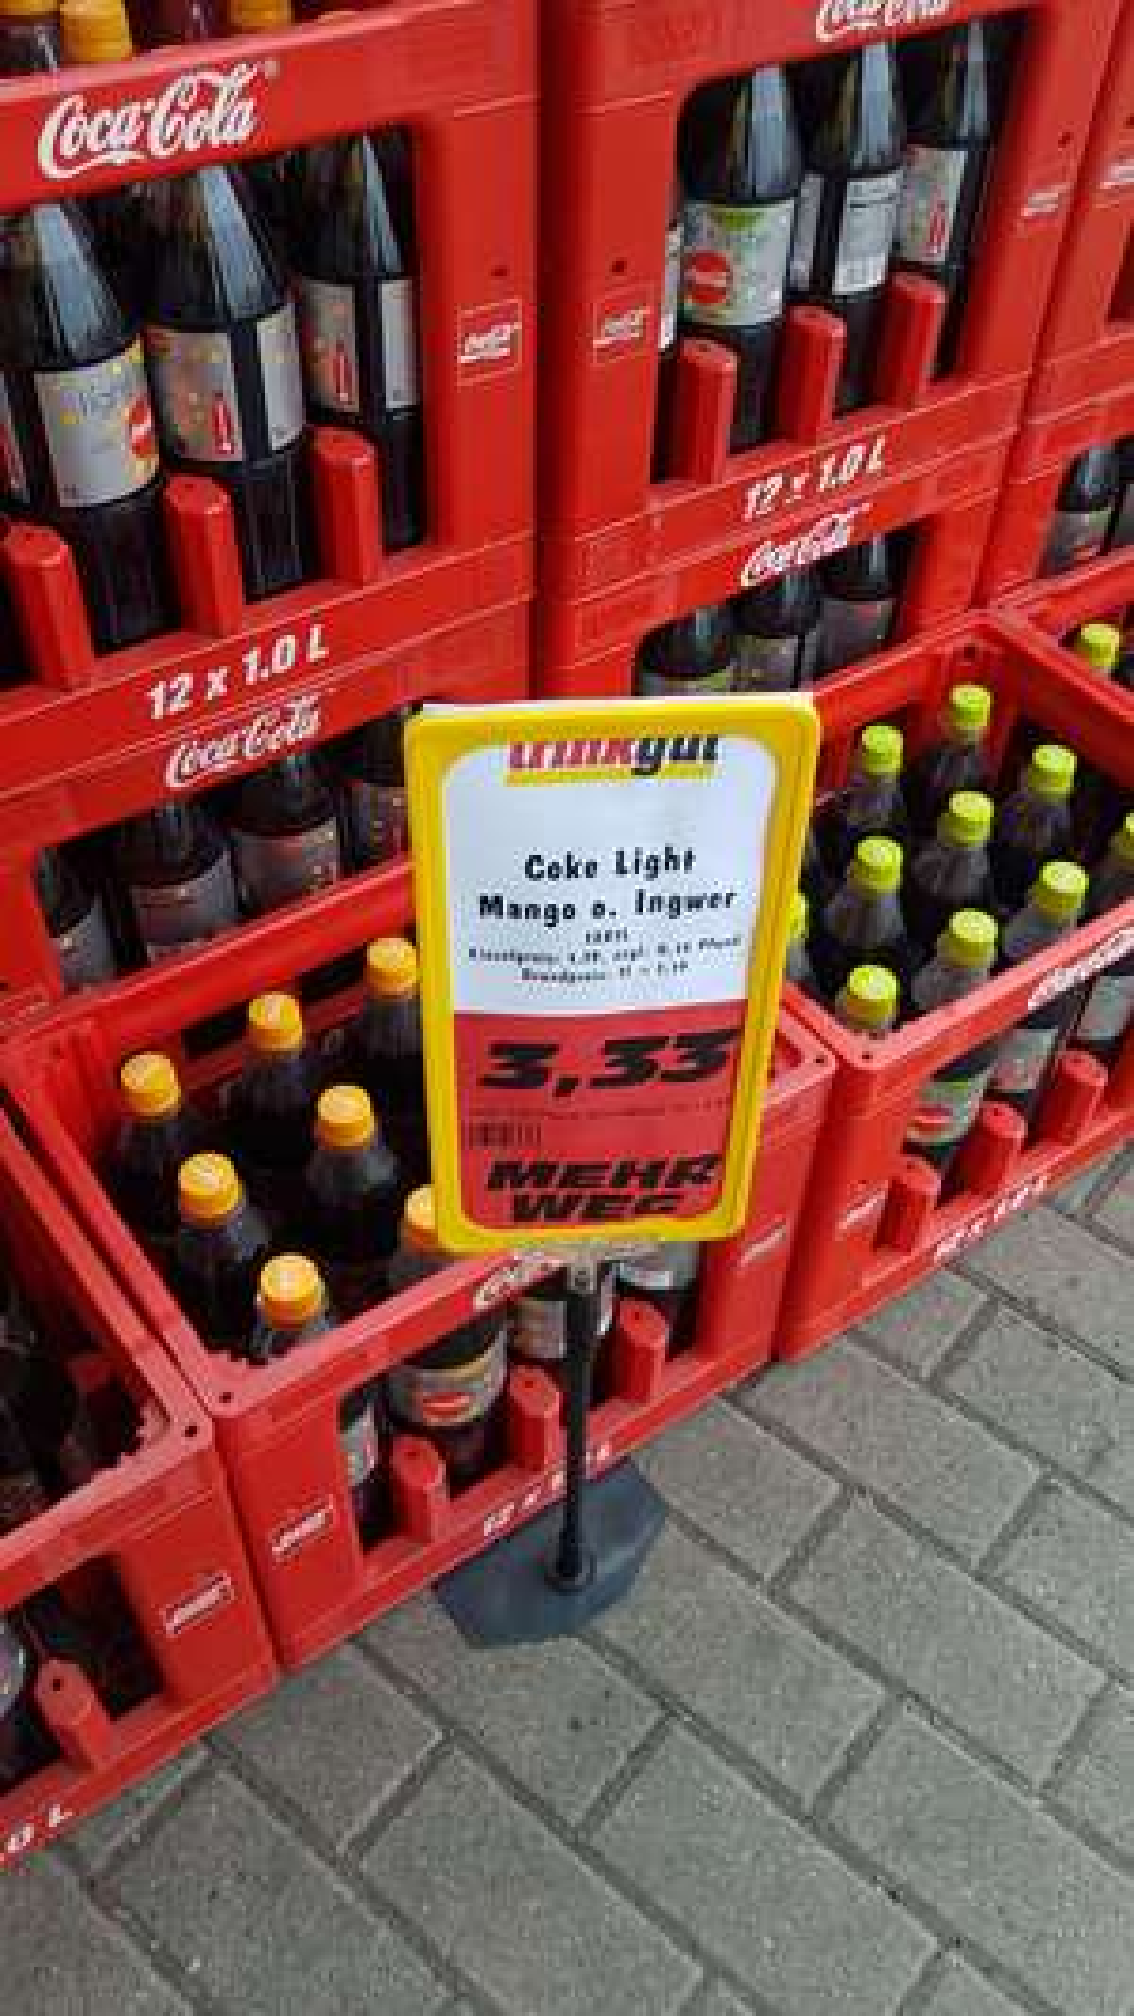 [Lokal] trinkgut Filiale Essen Zentrum - Kiste Coca Cola Coke Light Exotic Mango & Ginger Lime